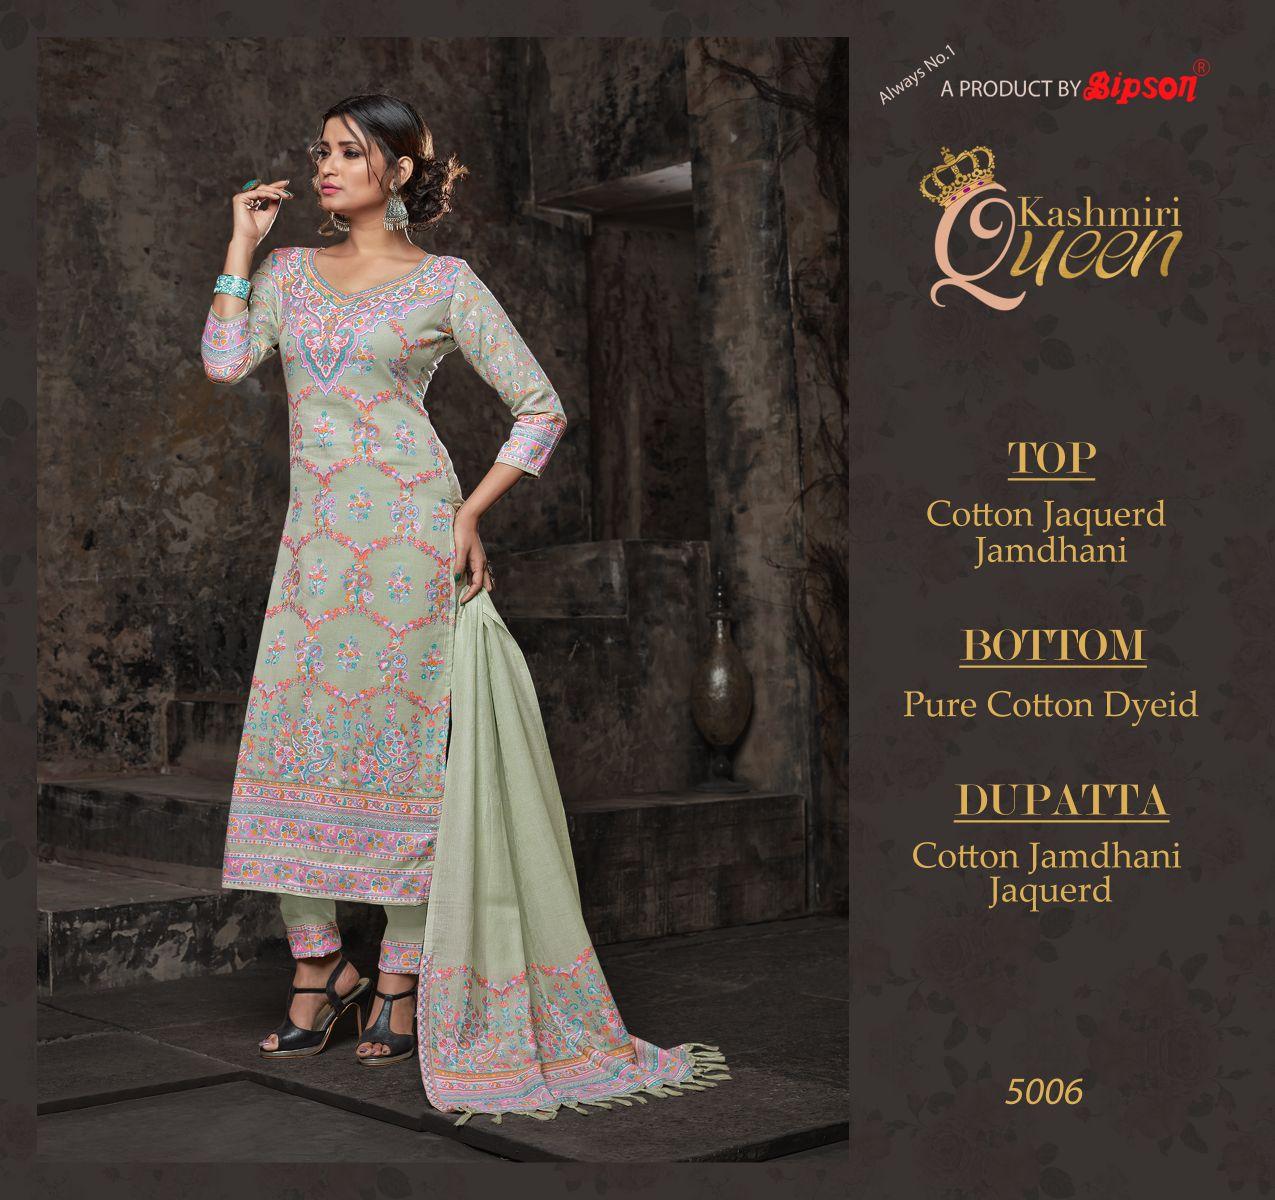 Bipson Kashmiri Queen 5006